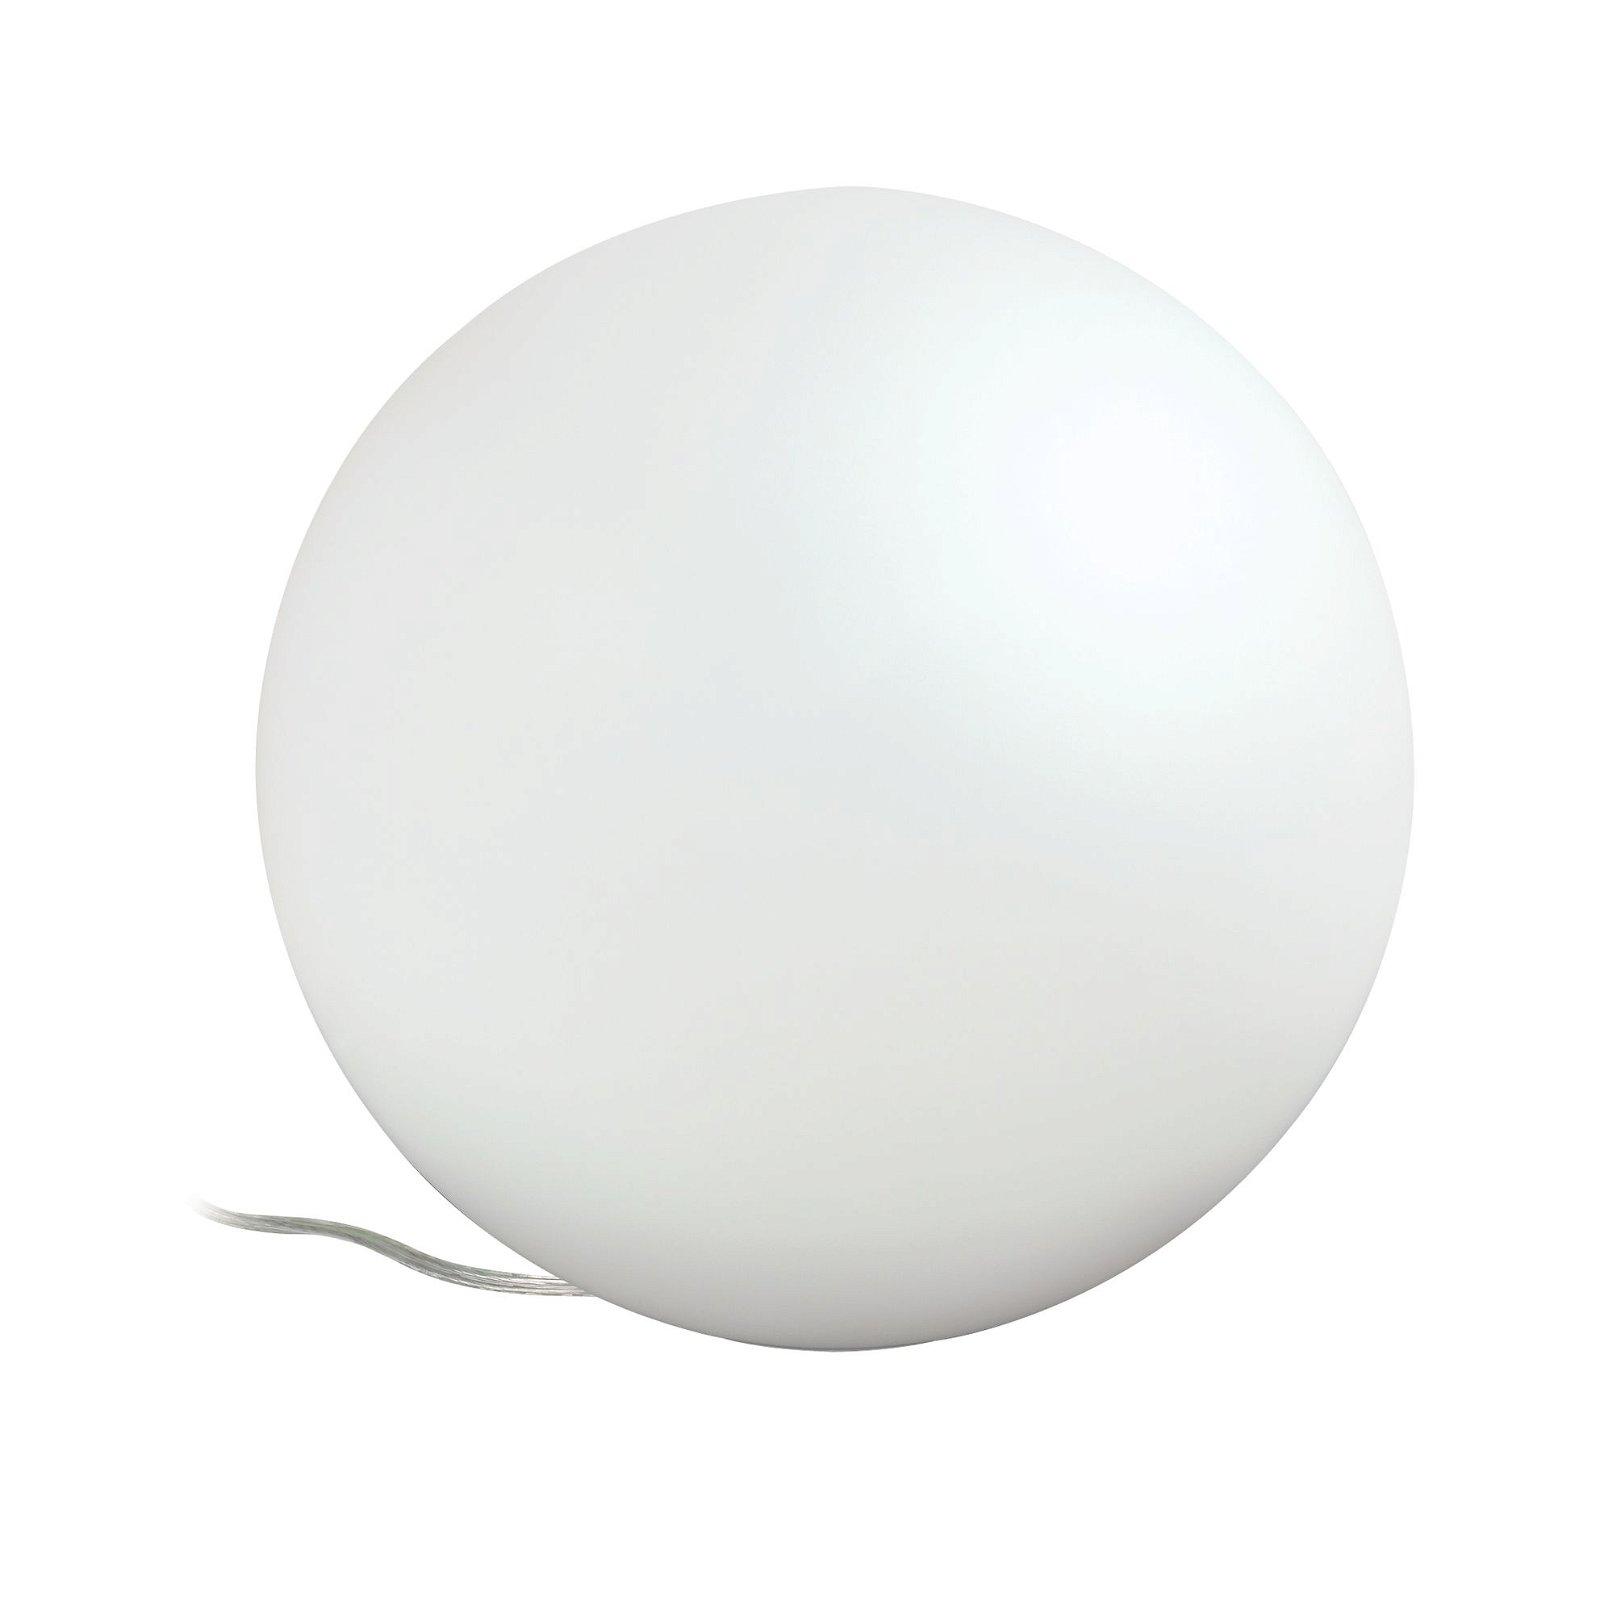 LED-tafellamp Siegen E27 RGBW 7,5W Opaal/Satijn